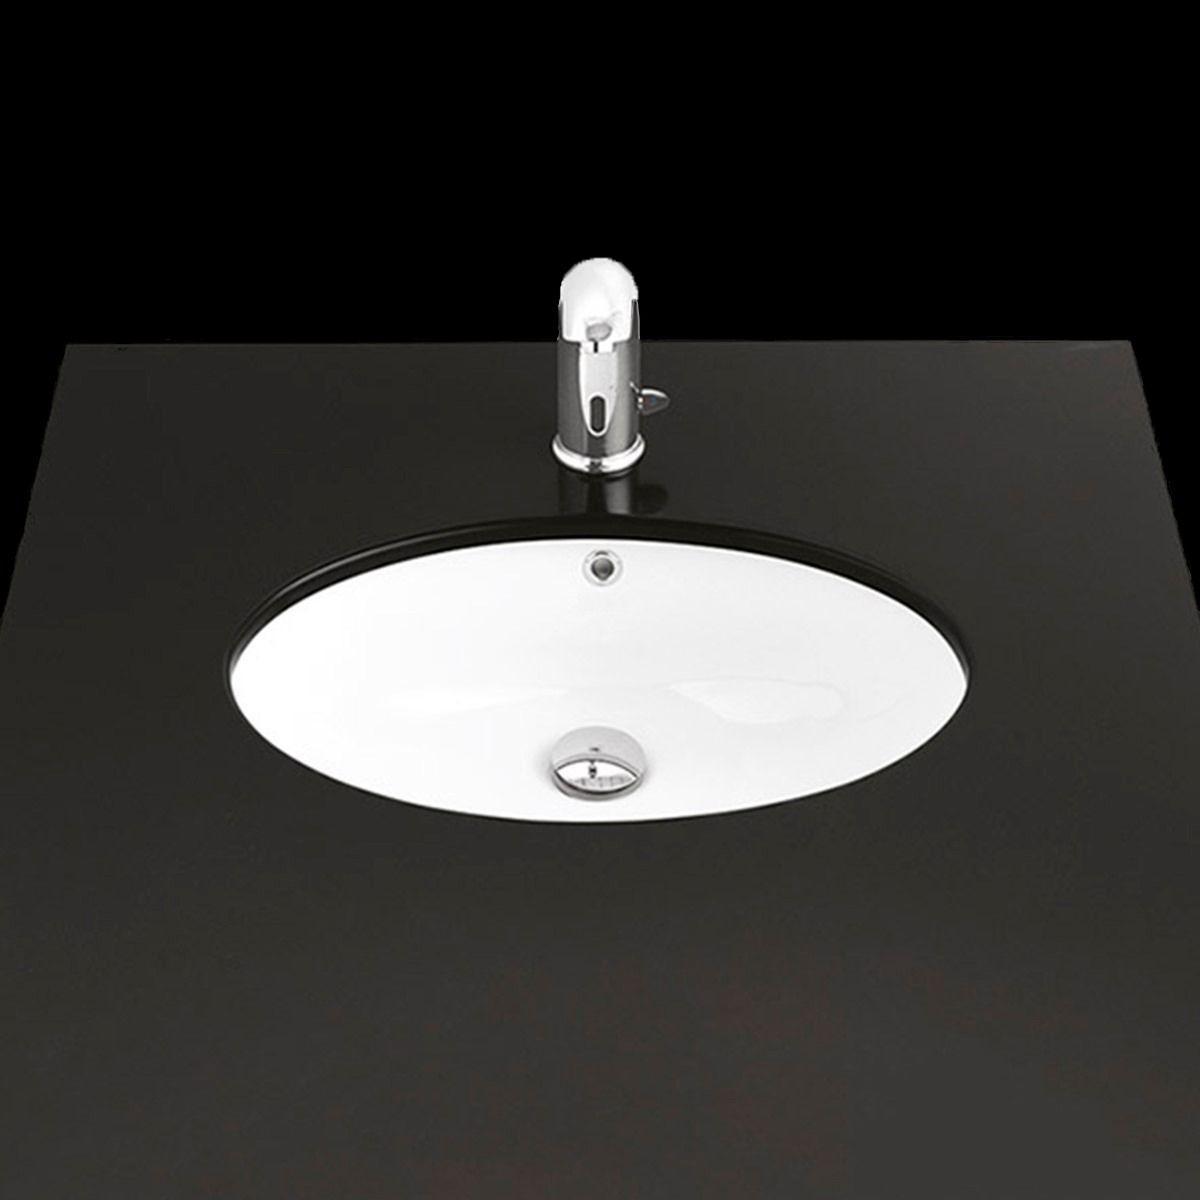 Ws Bath Collections Under Tp 216 Ceramic Oval Undermount Bathroom Sink 22 2 Modo Bath